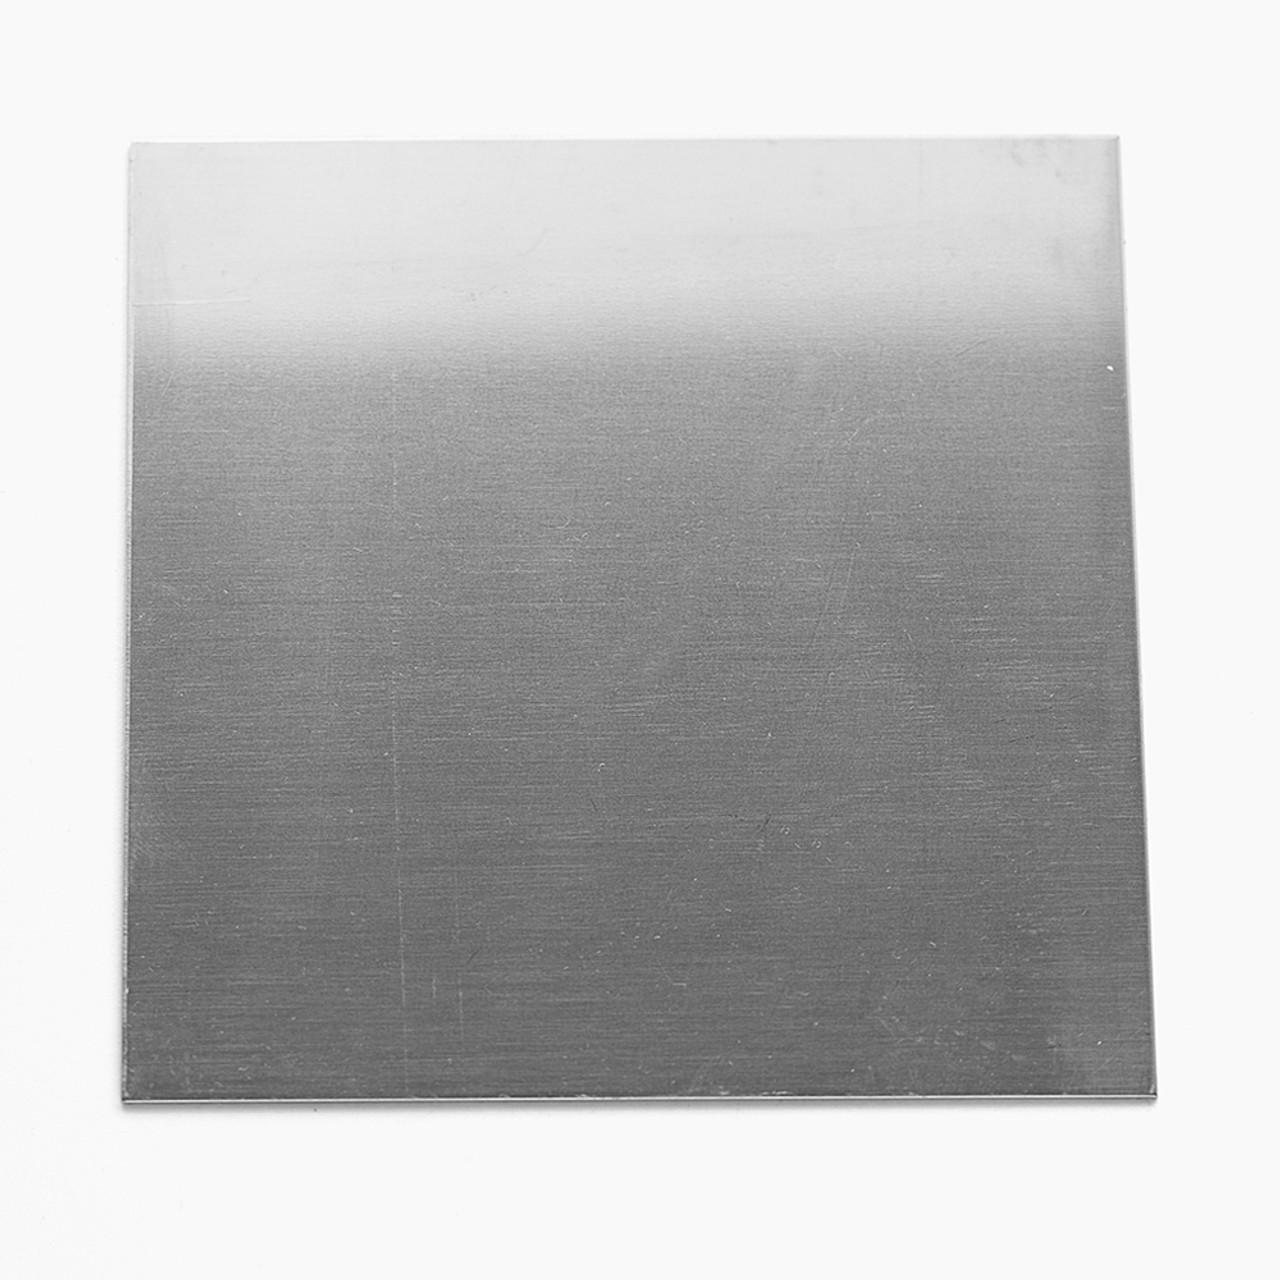 Square aluminium sheet